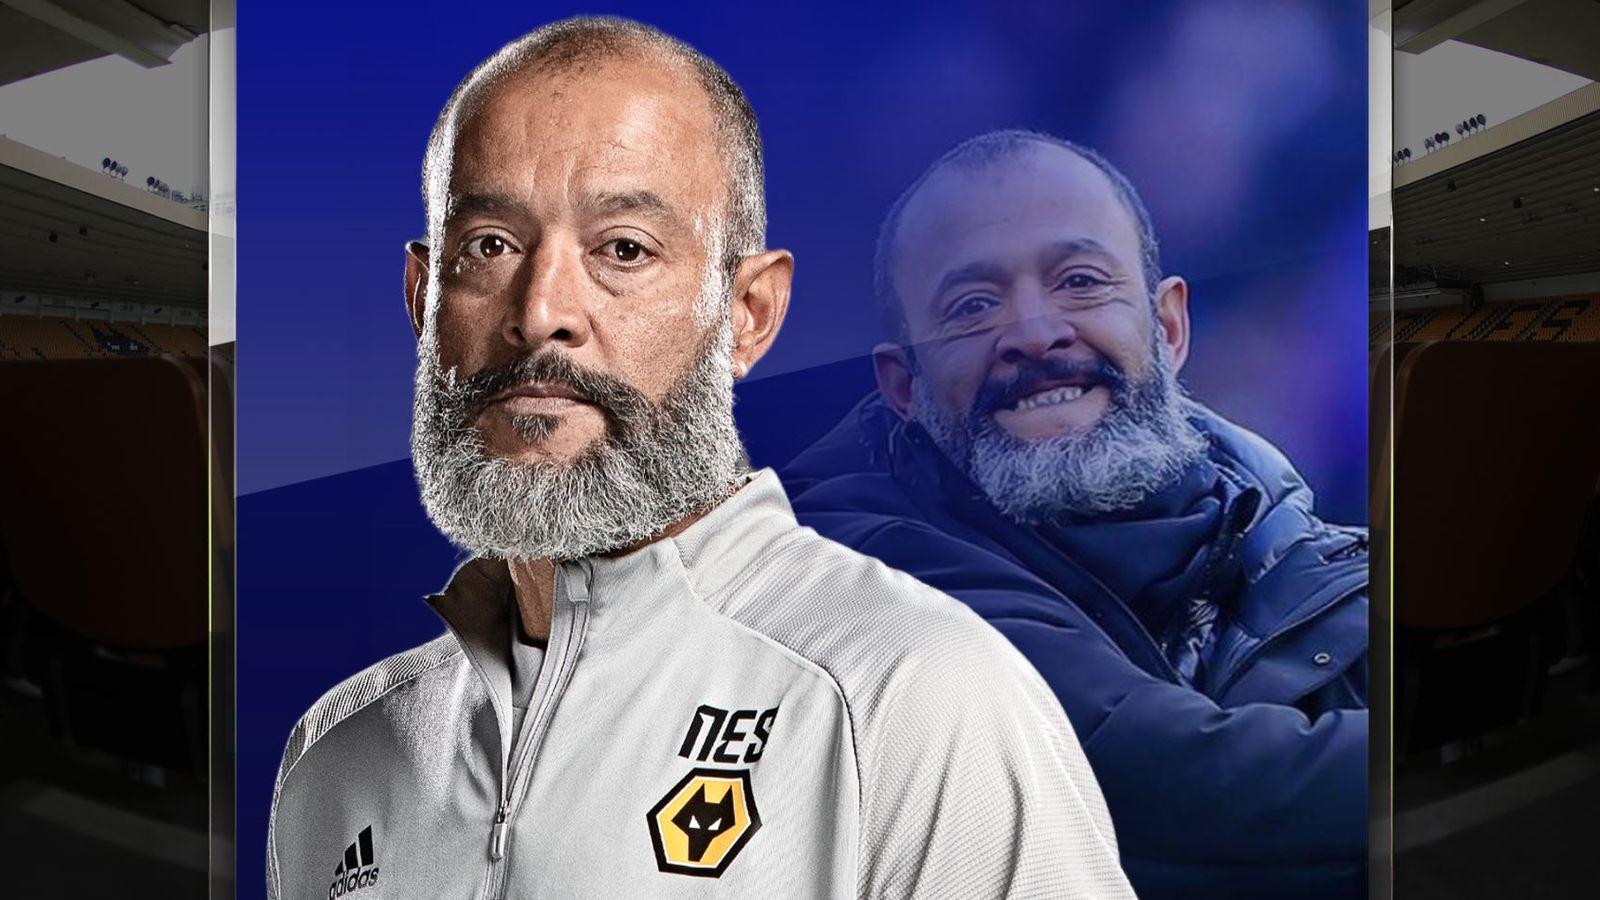 Nuno Espirito Santo Interview Wolves Boss On Toughest Season And Why His Team Can Come Through It Stronger Football News Sky Sports